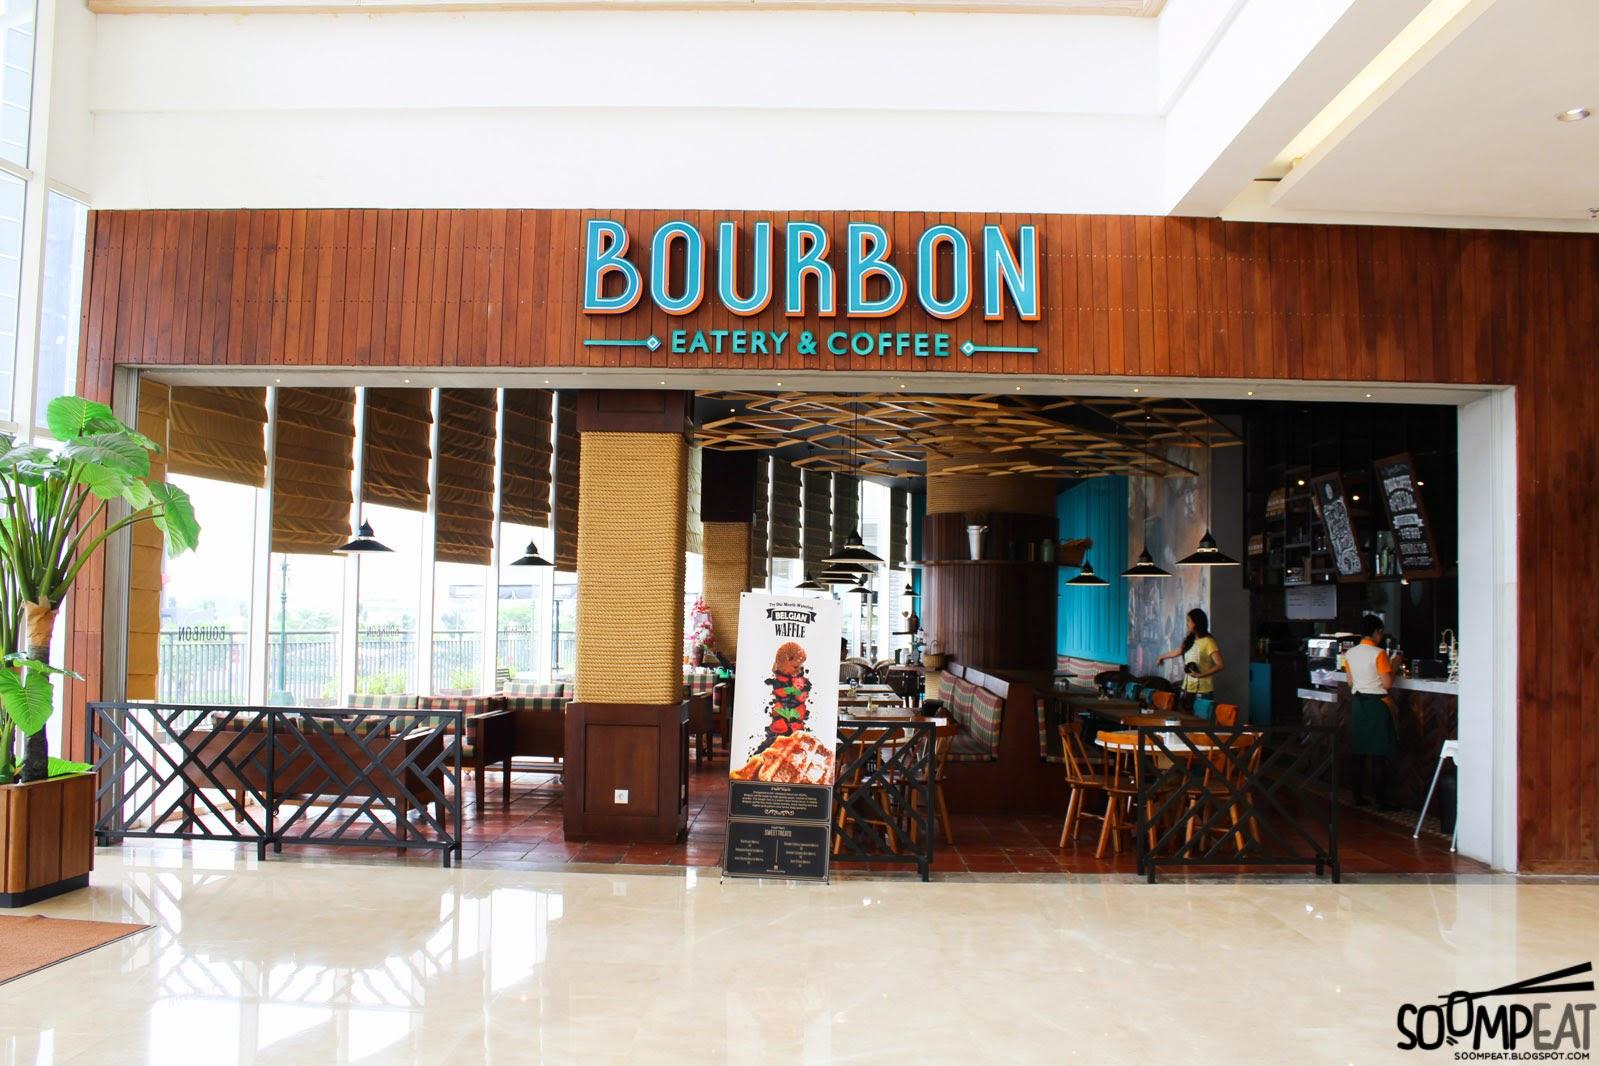 Bourbon eatery coffee mall alam sutera tangerang soompeat bourbon eatery coffee mall alam sutera tangerang altavistaventures Image collections